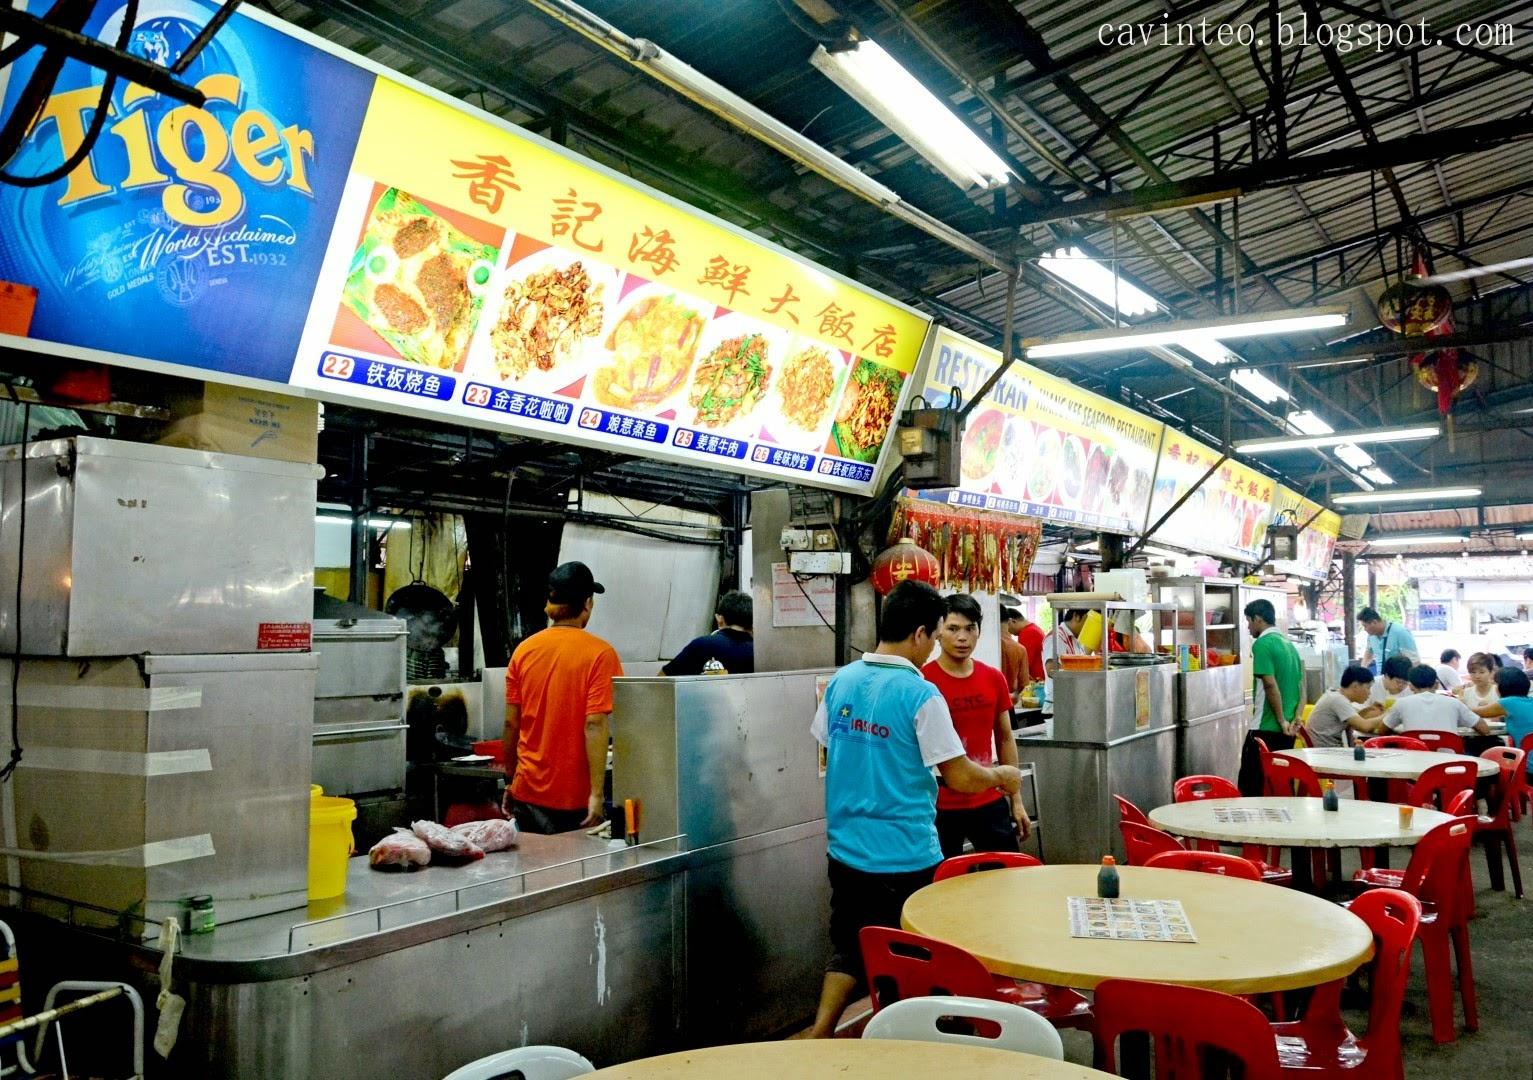 Entree kibbles hiang kee seafood restaurant 香记海鲜大饭店